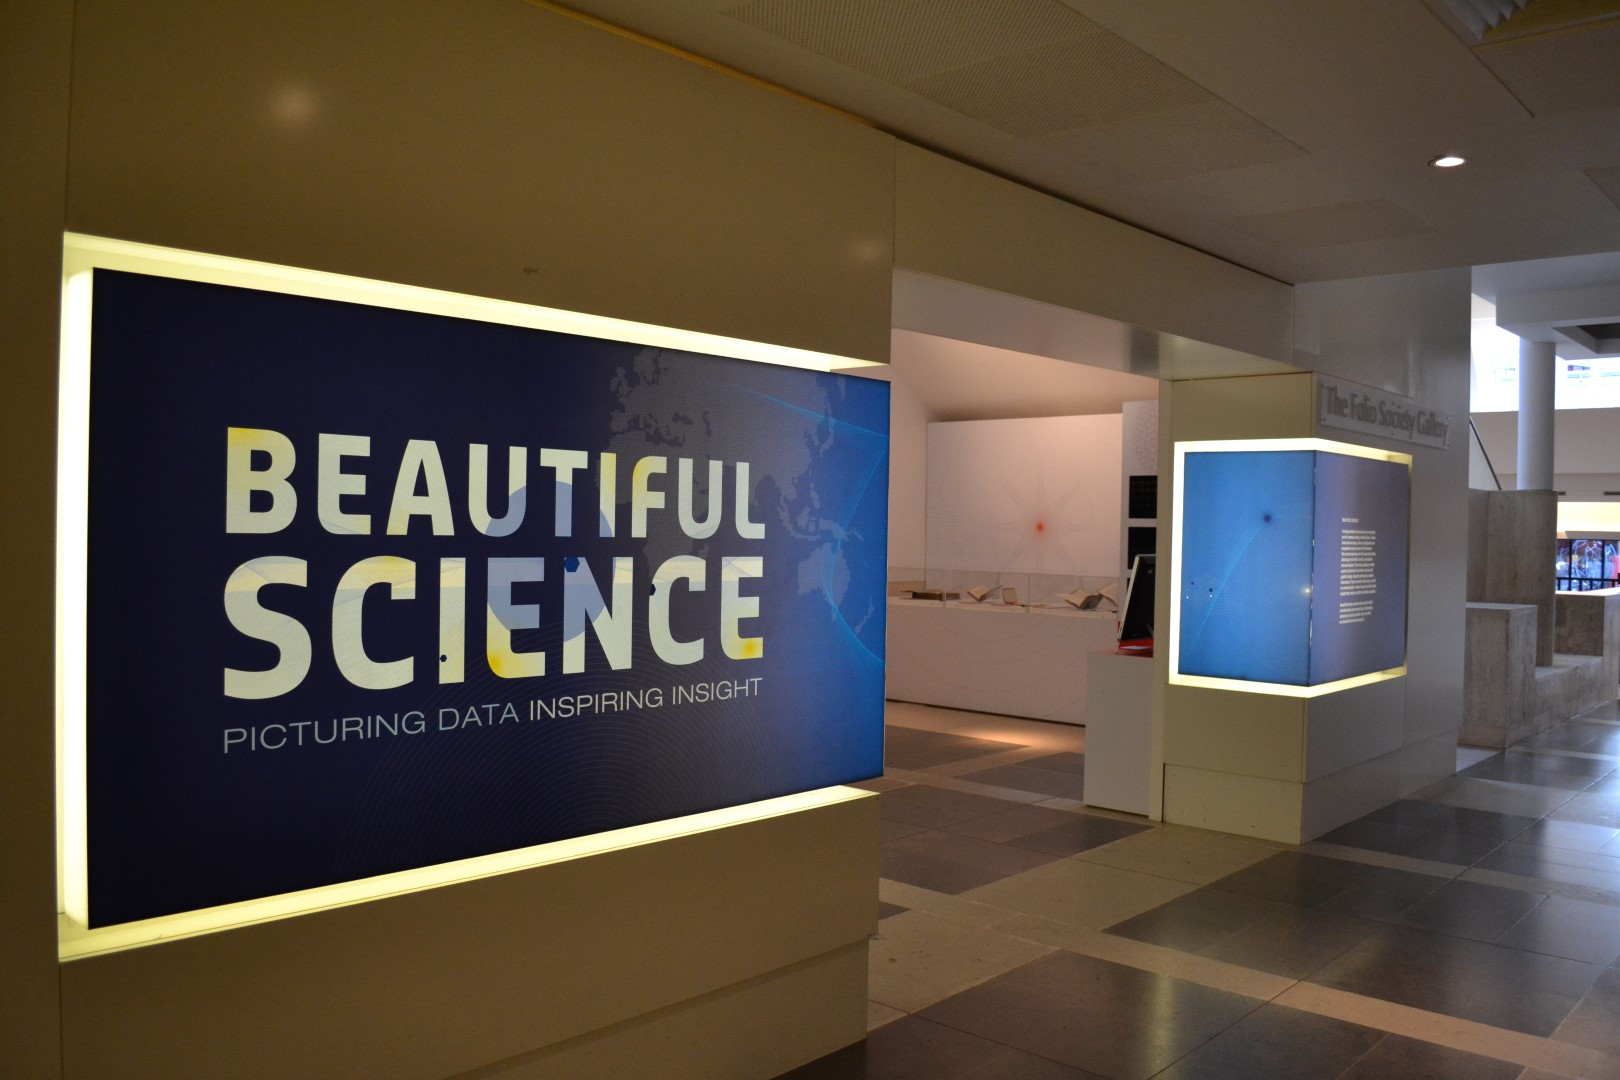 BL Beautiful Science_0026 (Large).JPG